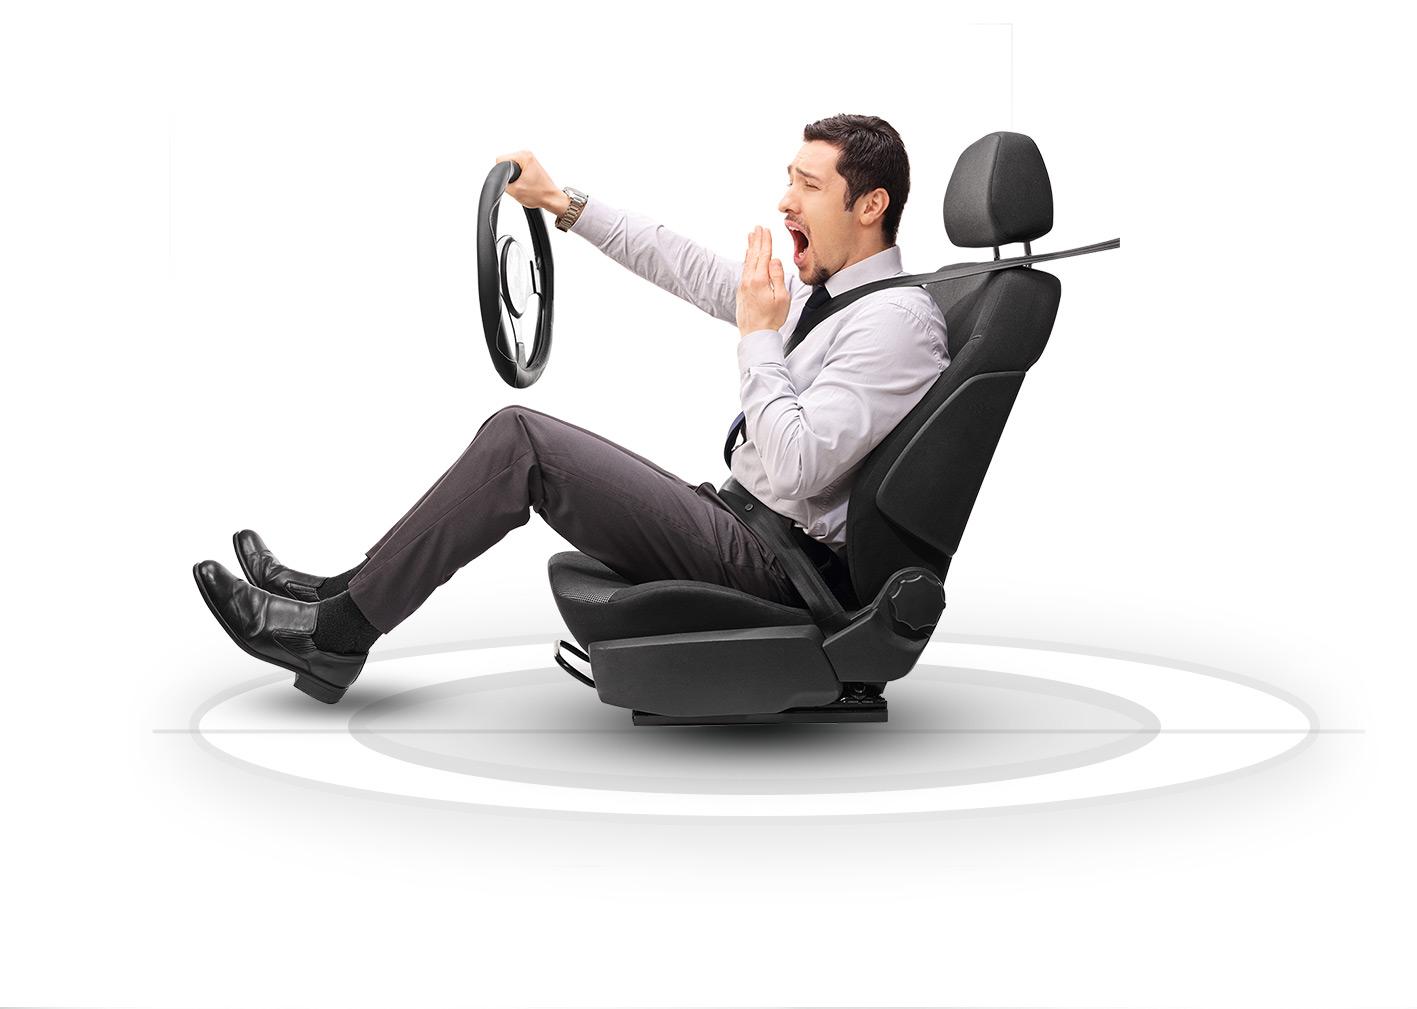 Guy driving imaginary vehicle